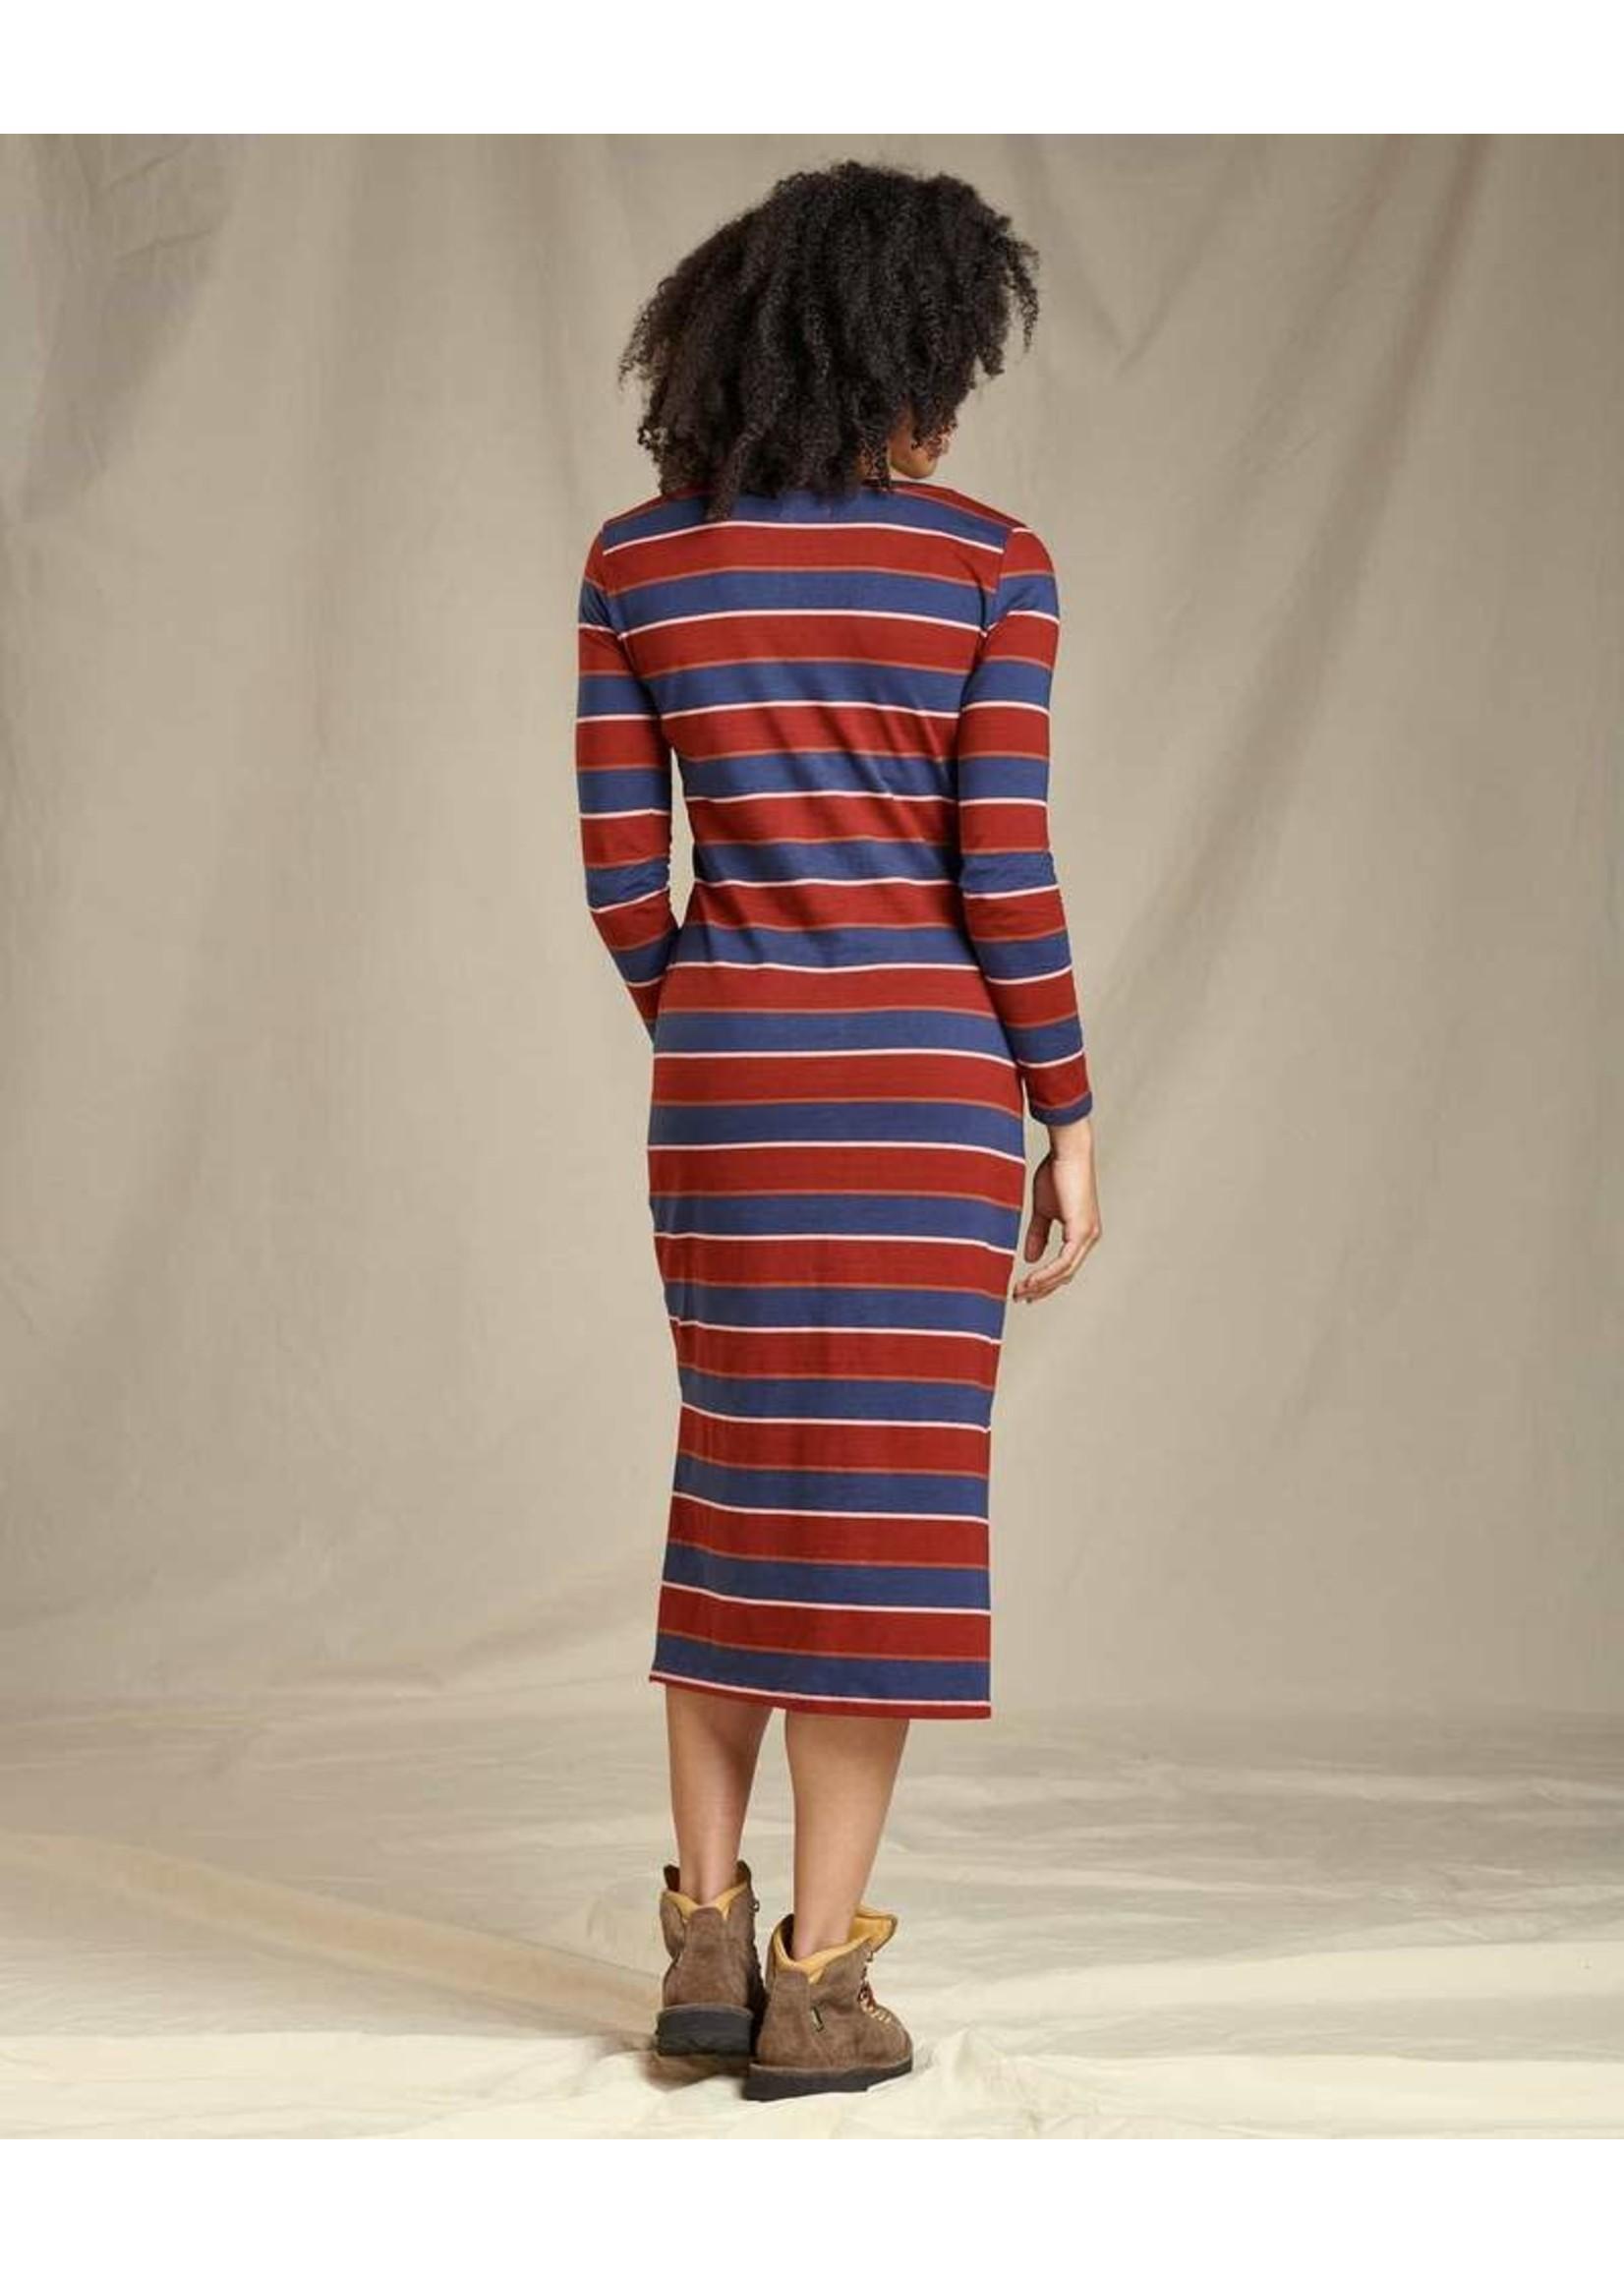 TOAD & CO Robe Montclair Midi / Large / Rouge & bleu